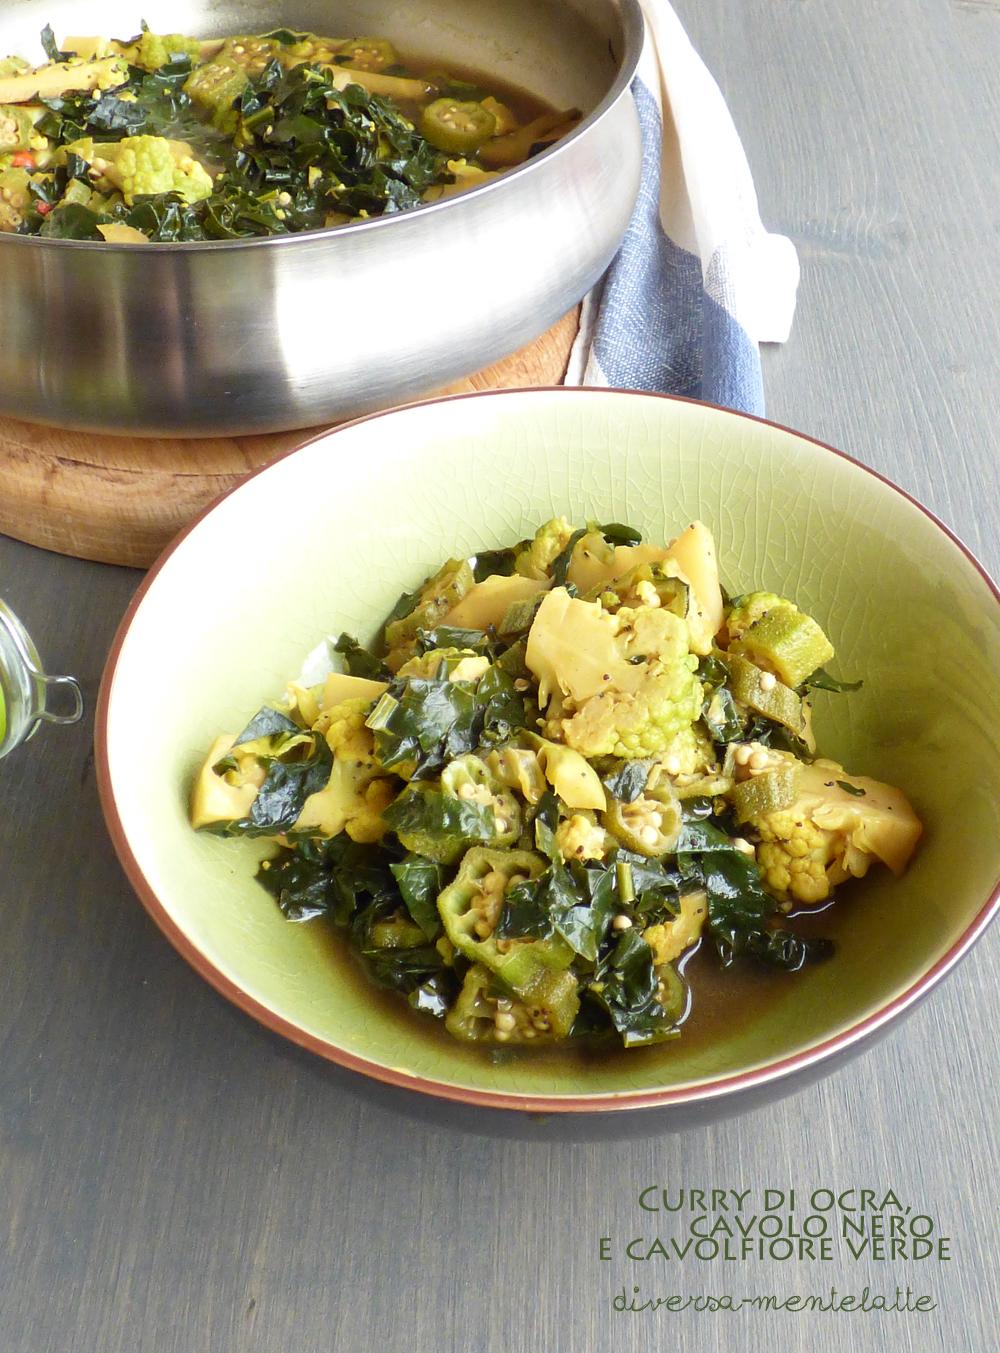 curry ocra cavolo nero